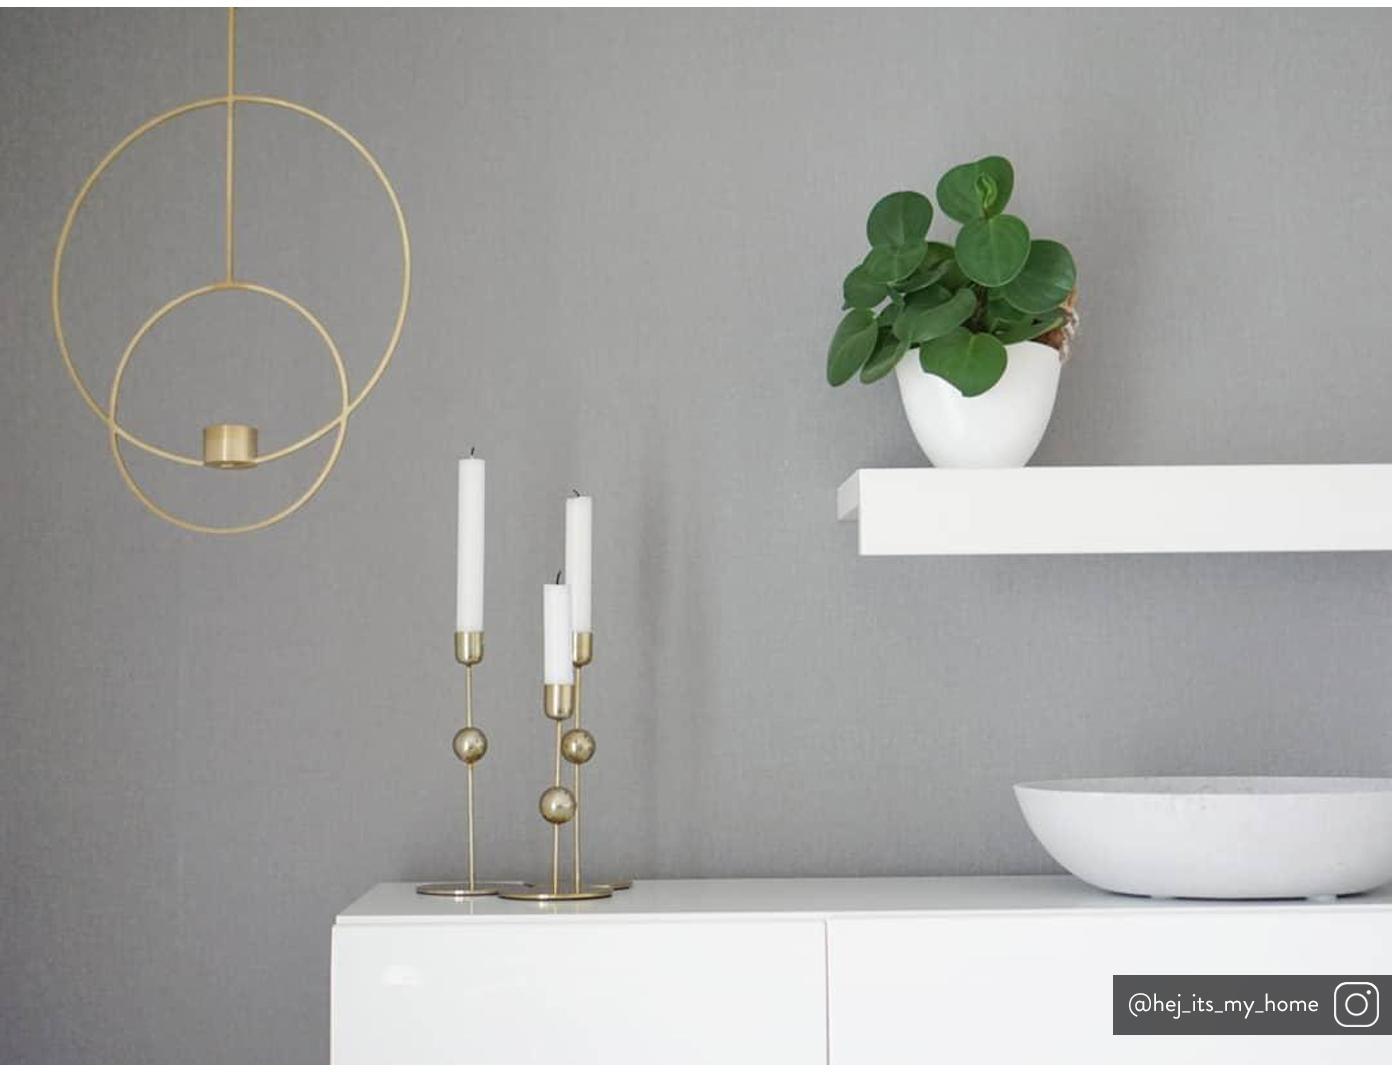 Velas candelabro Stick, 4uds., Parafina, Blanco, Ø 2 x Al 25 cm